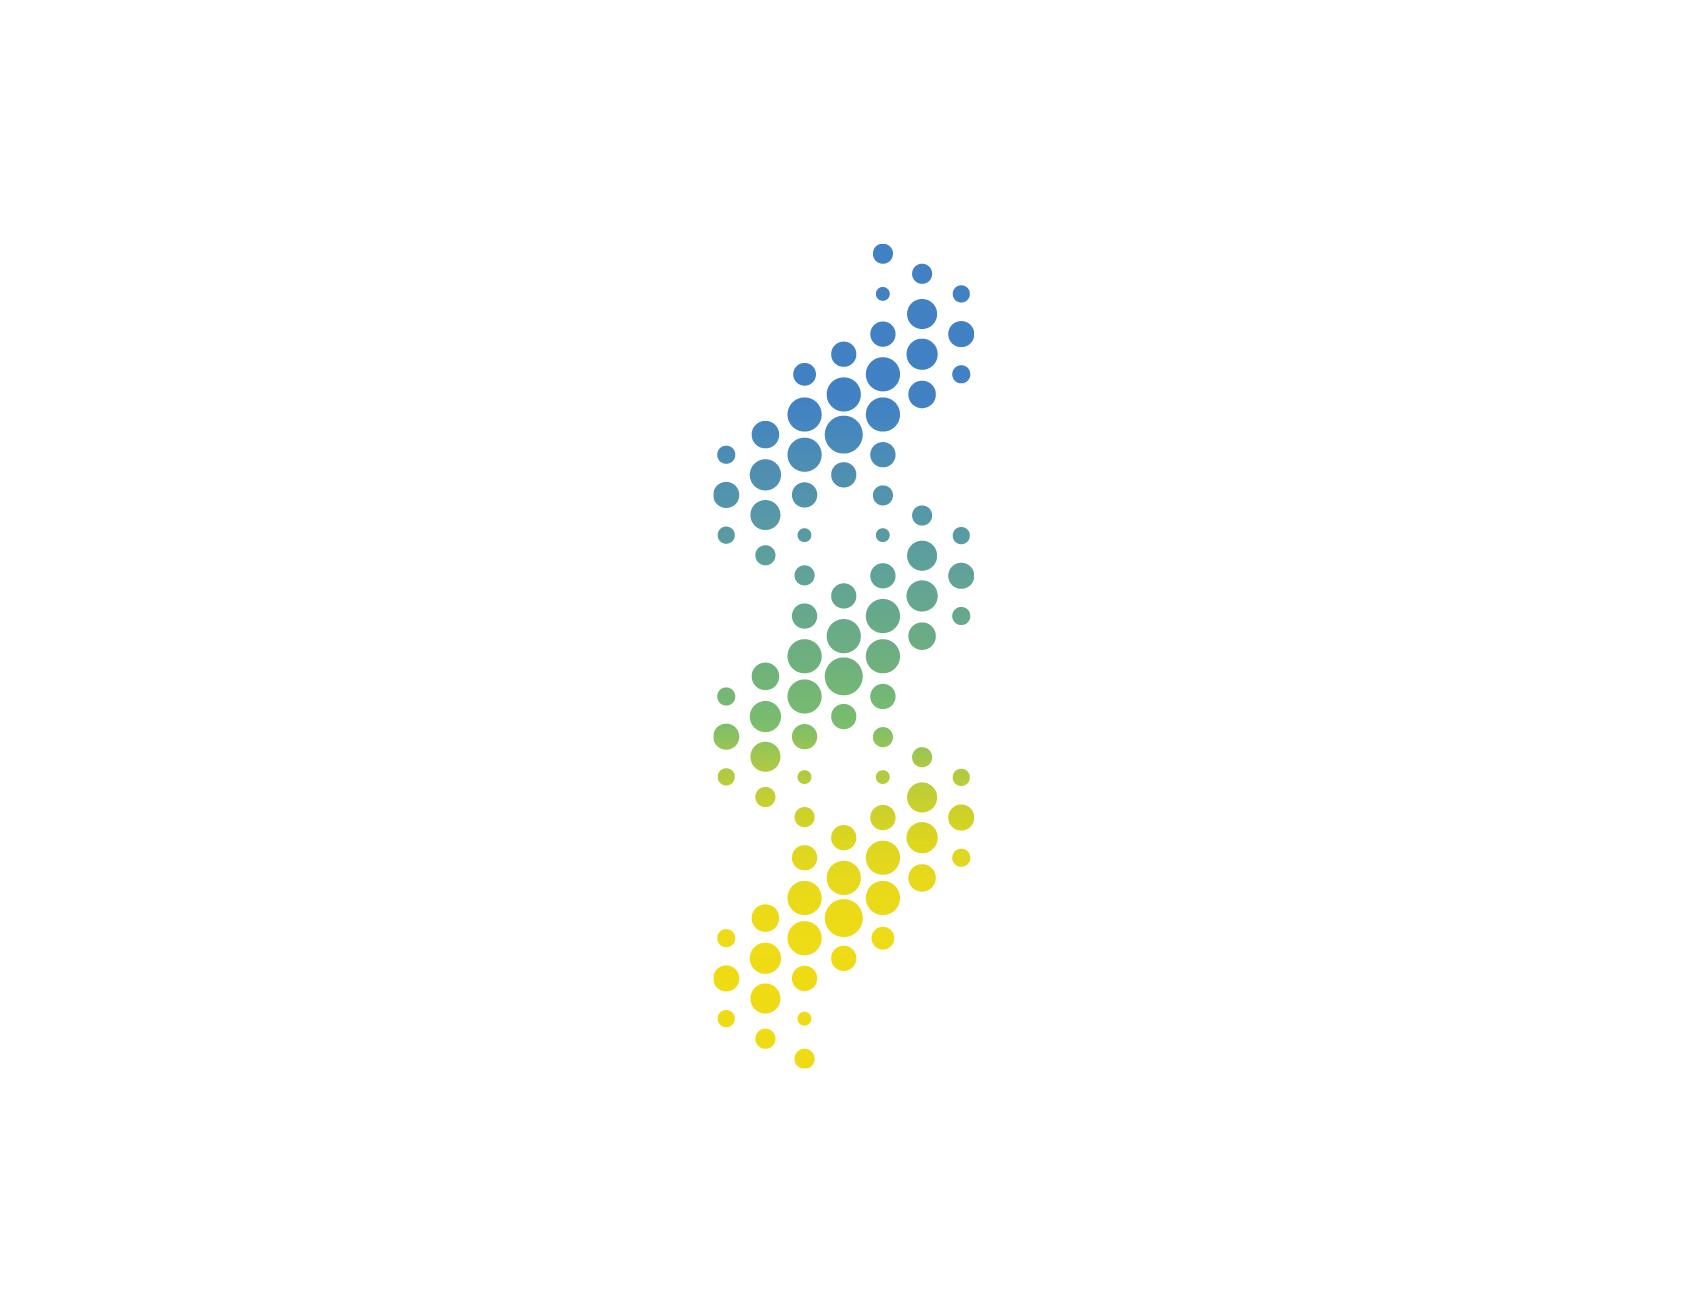 Logos-40.jpg